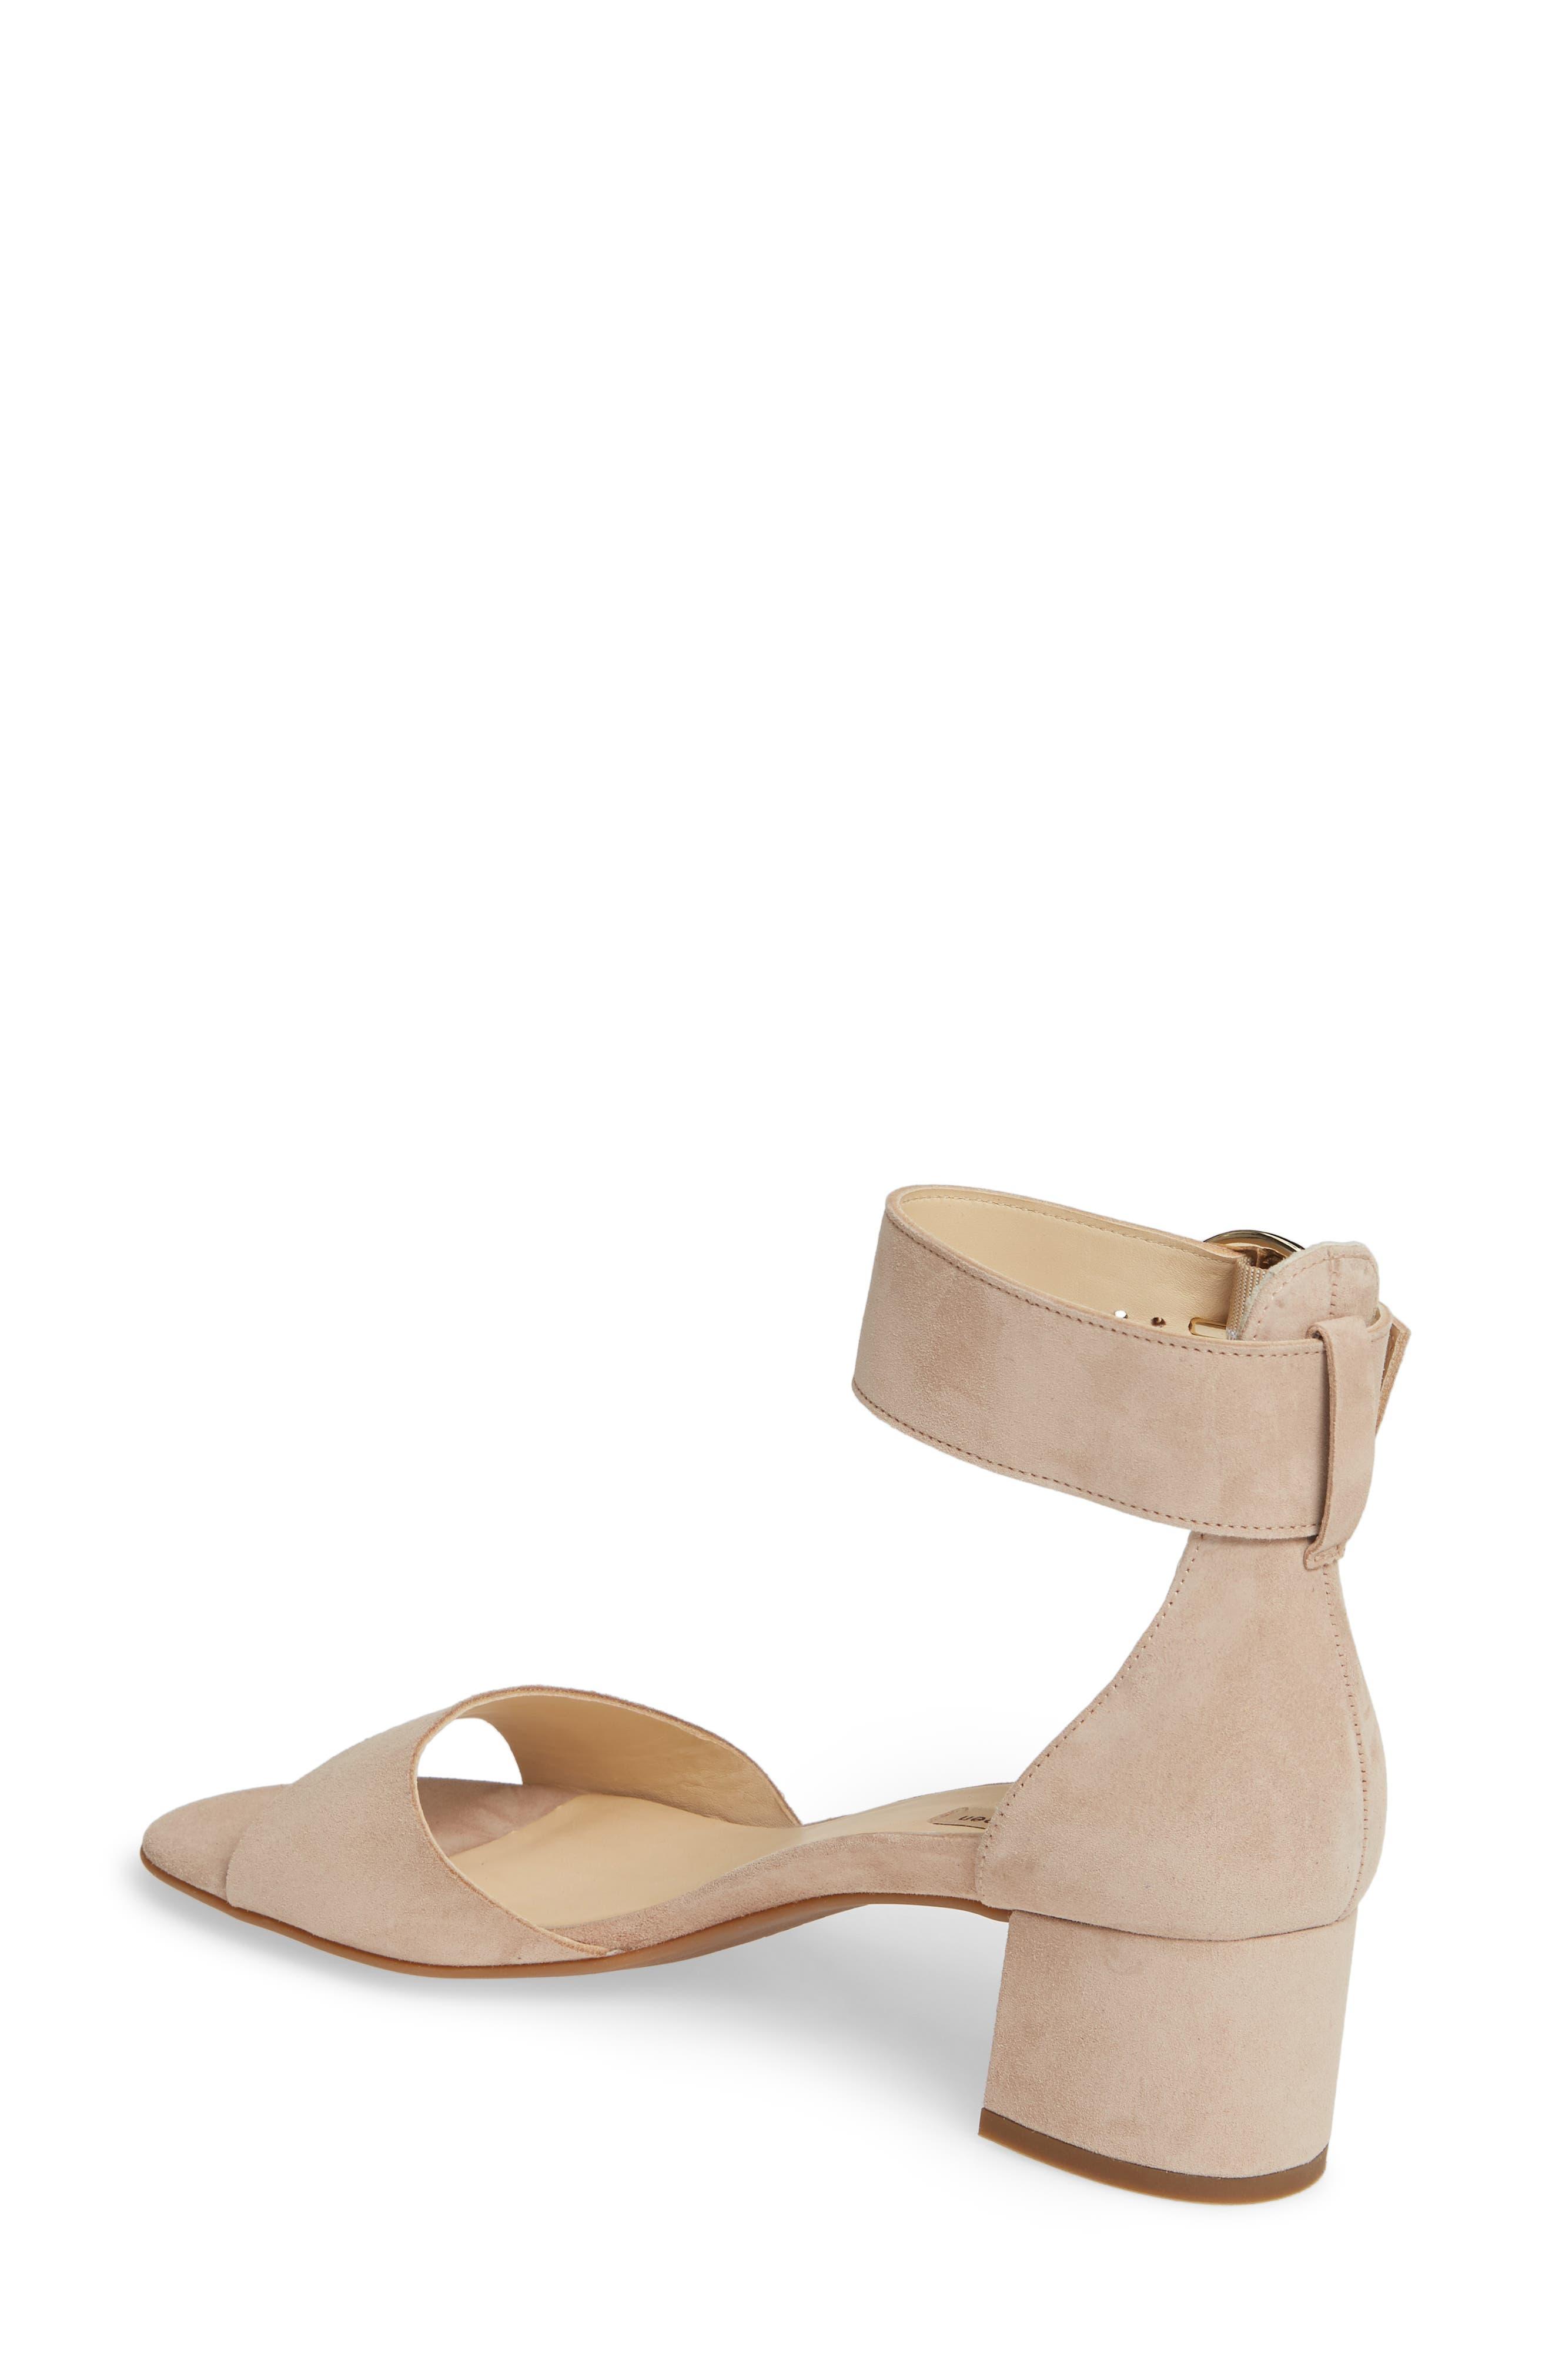 PAUL GREEN, Velma Ankle Strap Sandal, Alternate thumbnail 2, color, SAHARA SUEDE